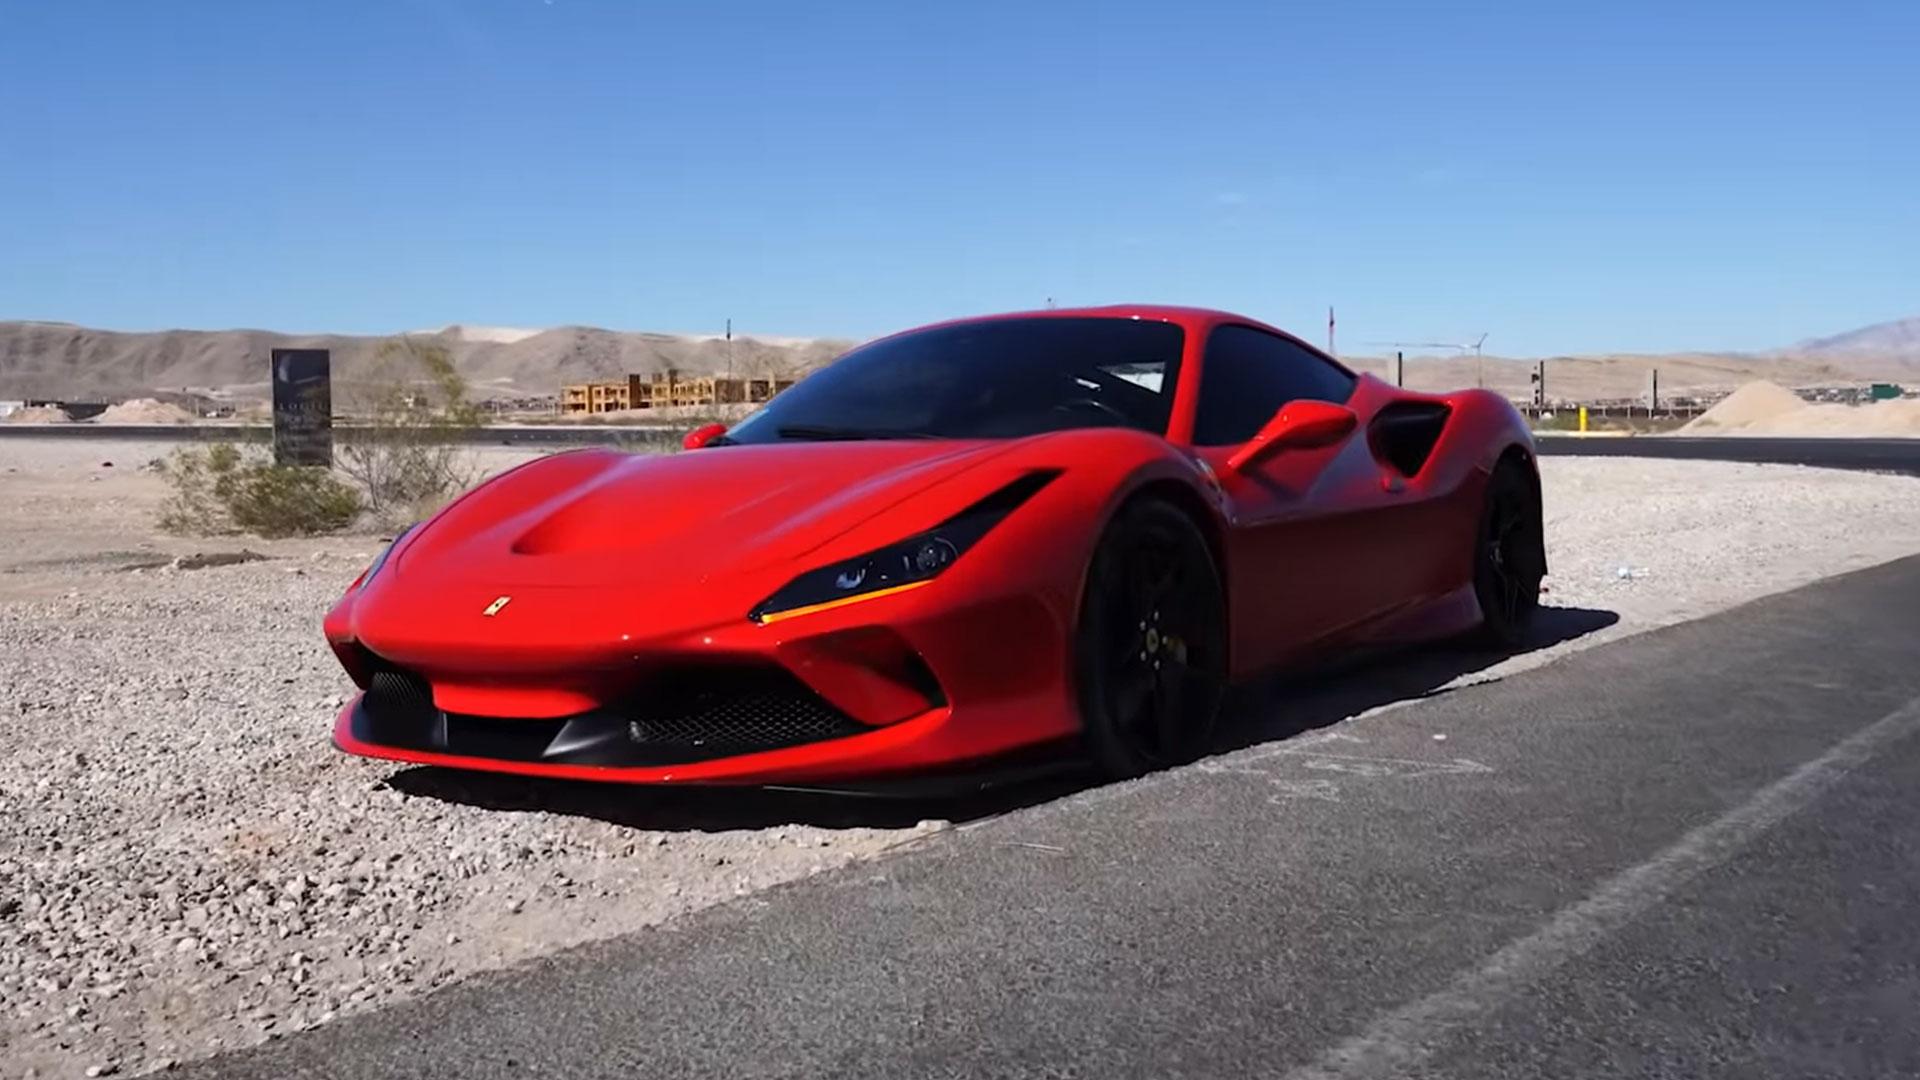 Ferrari F8 Tributo total loss langs de snelweg in Las Vegas